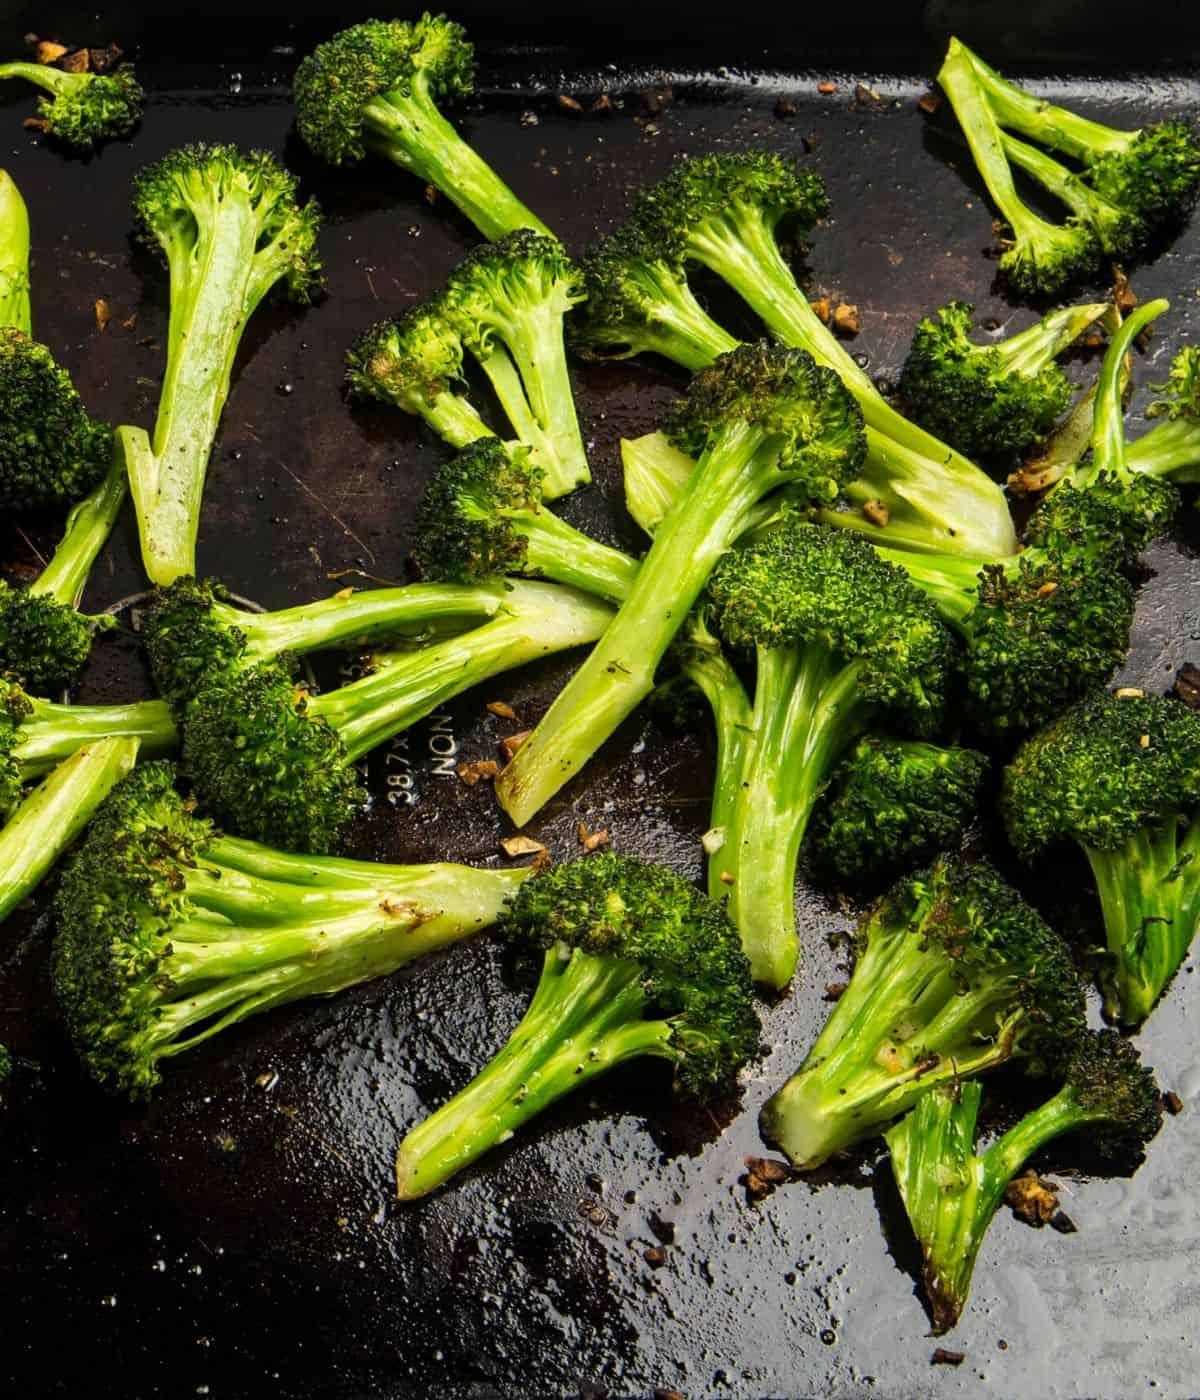 Roasted broccoli florets with garlic